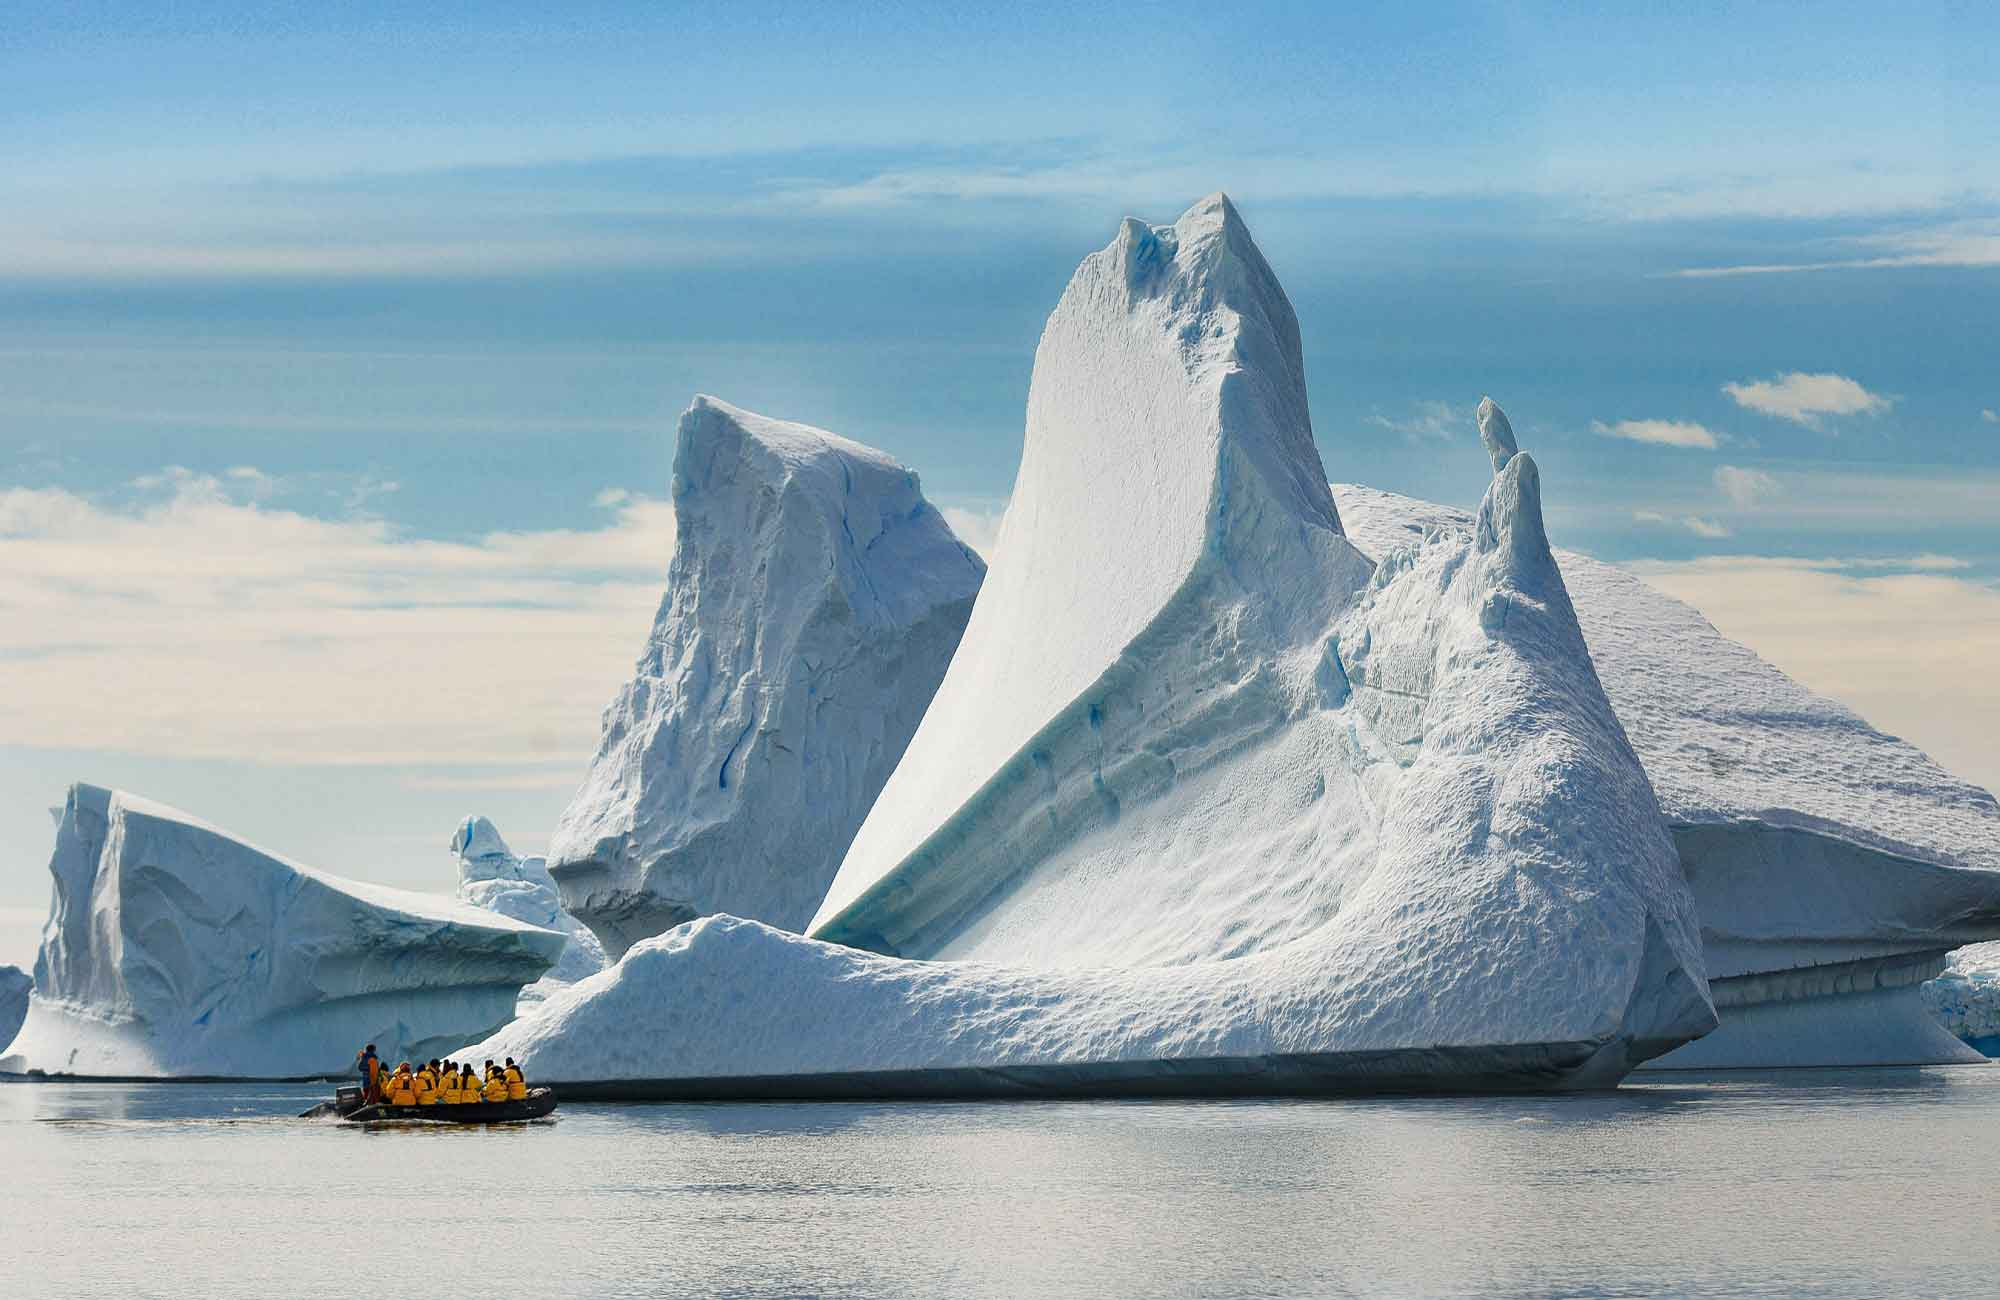 Balade entre les icebergs d'Antarctique